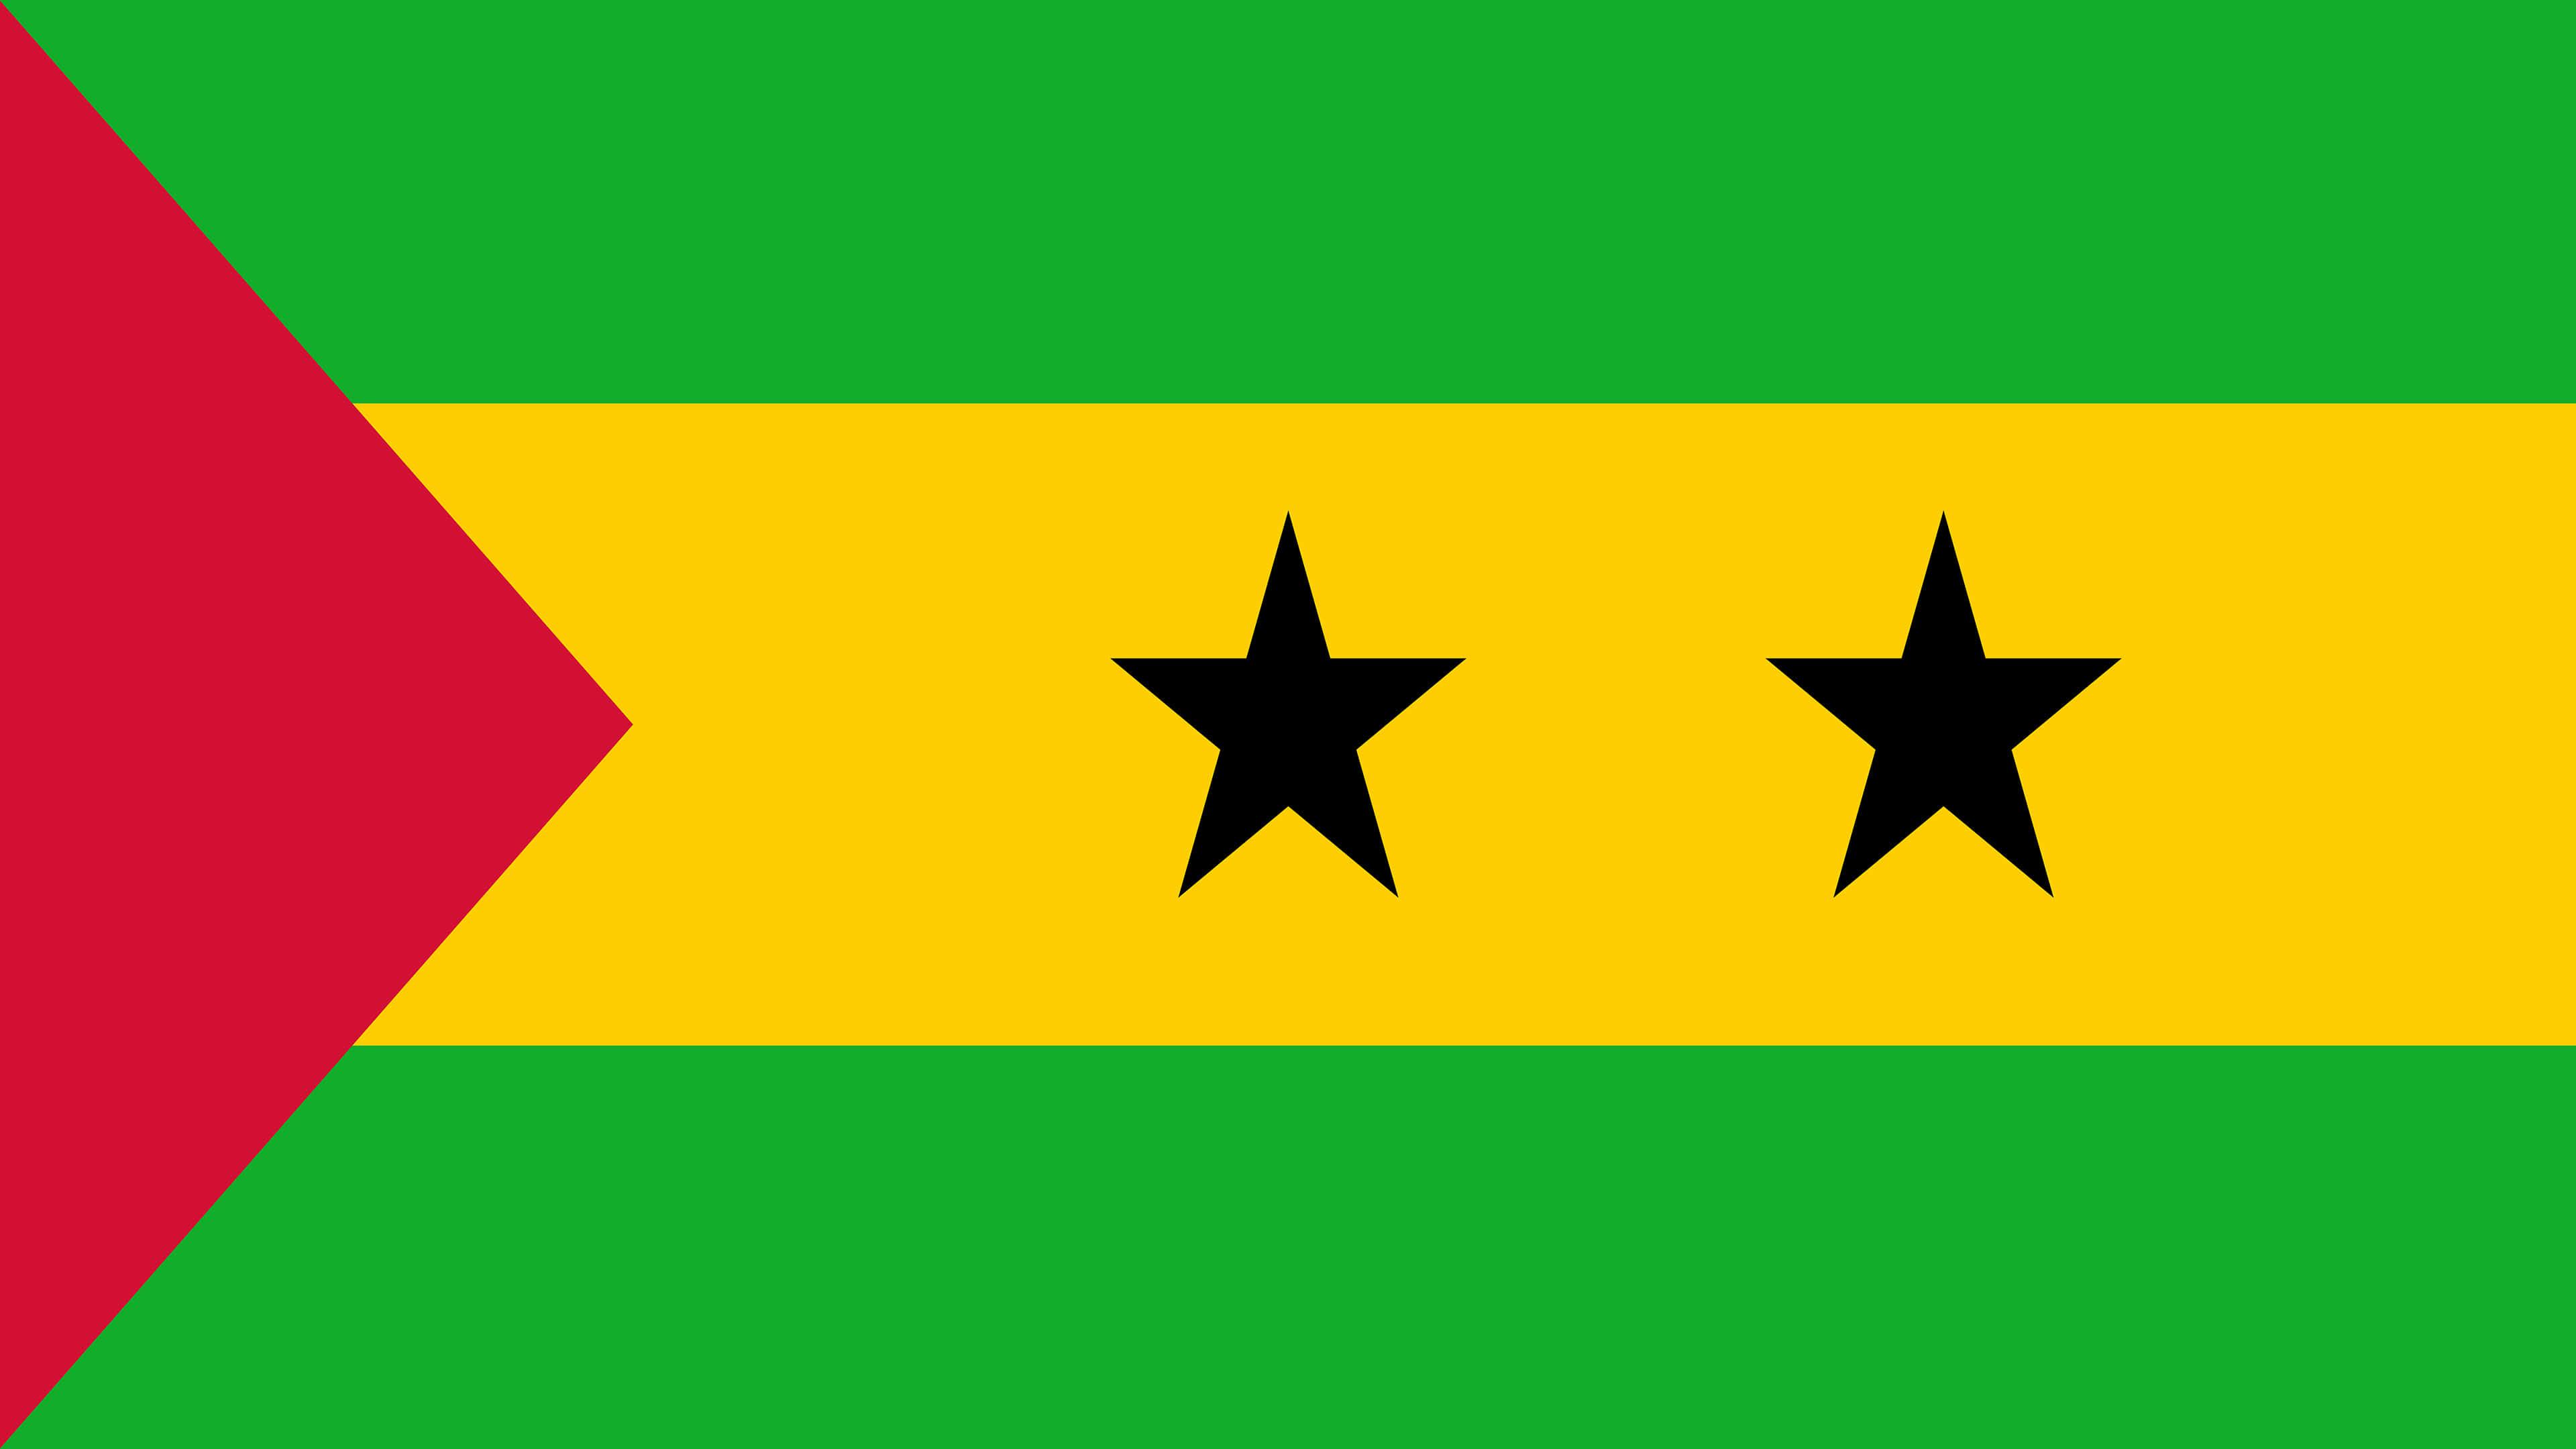 Sao Tome And Principe Flag UHD 4K Wallpaper Pixelz 3840x2160